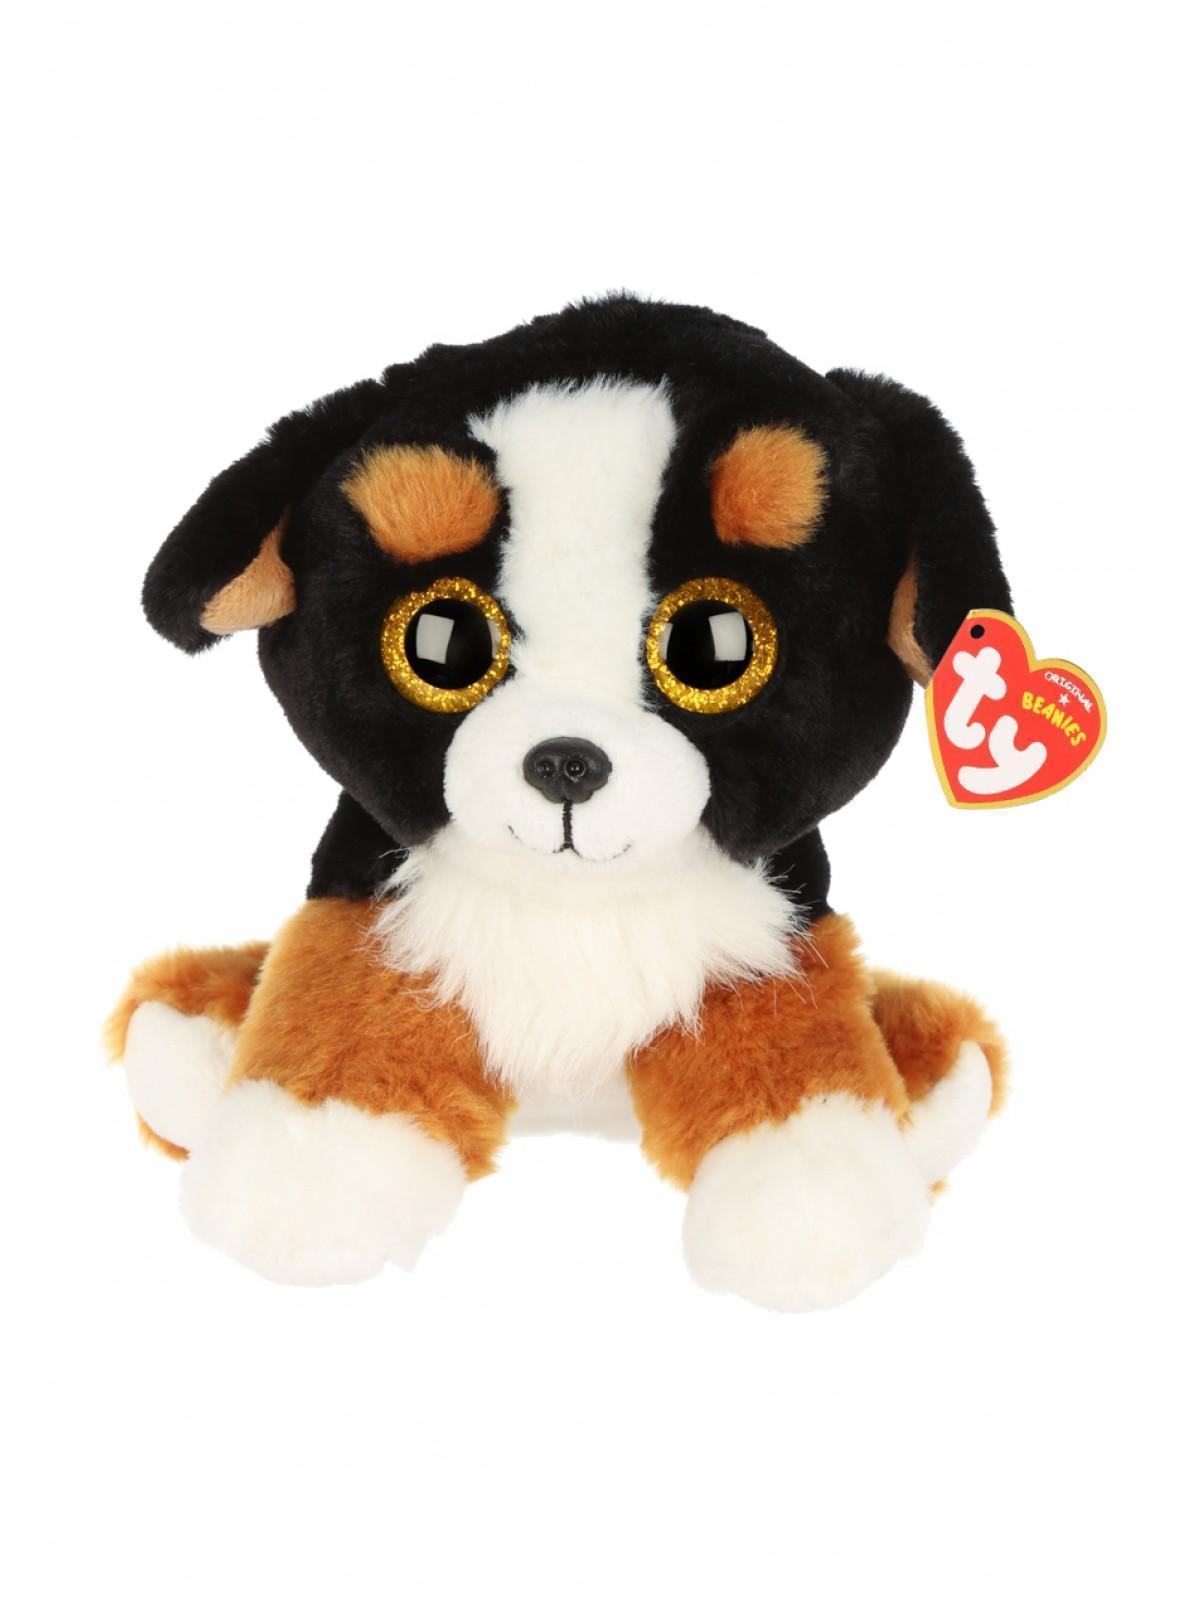 ... affordable price 8482e 0916e Girls TY Beanie Baby Plush - Roscoe the Dog  Peacocks ... 689c20ad2116